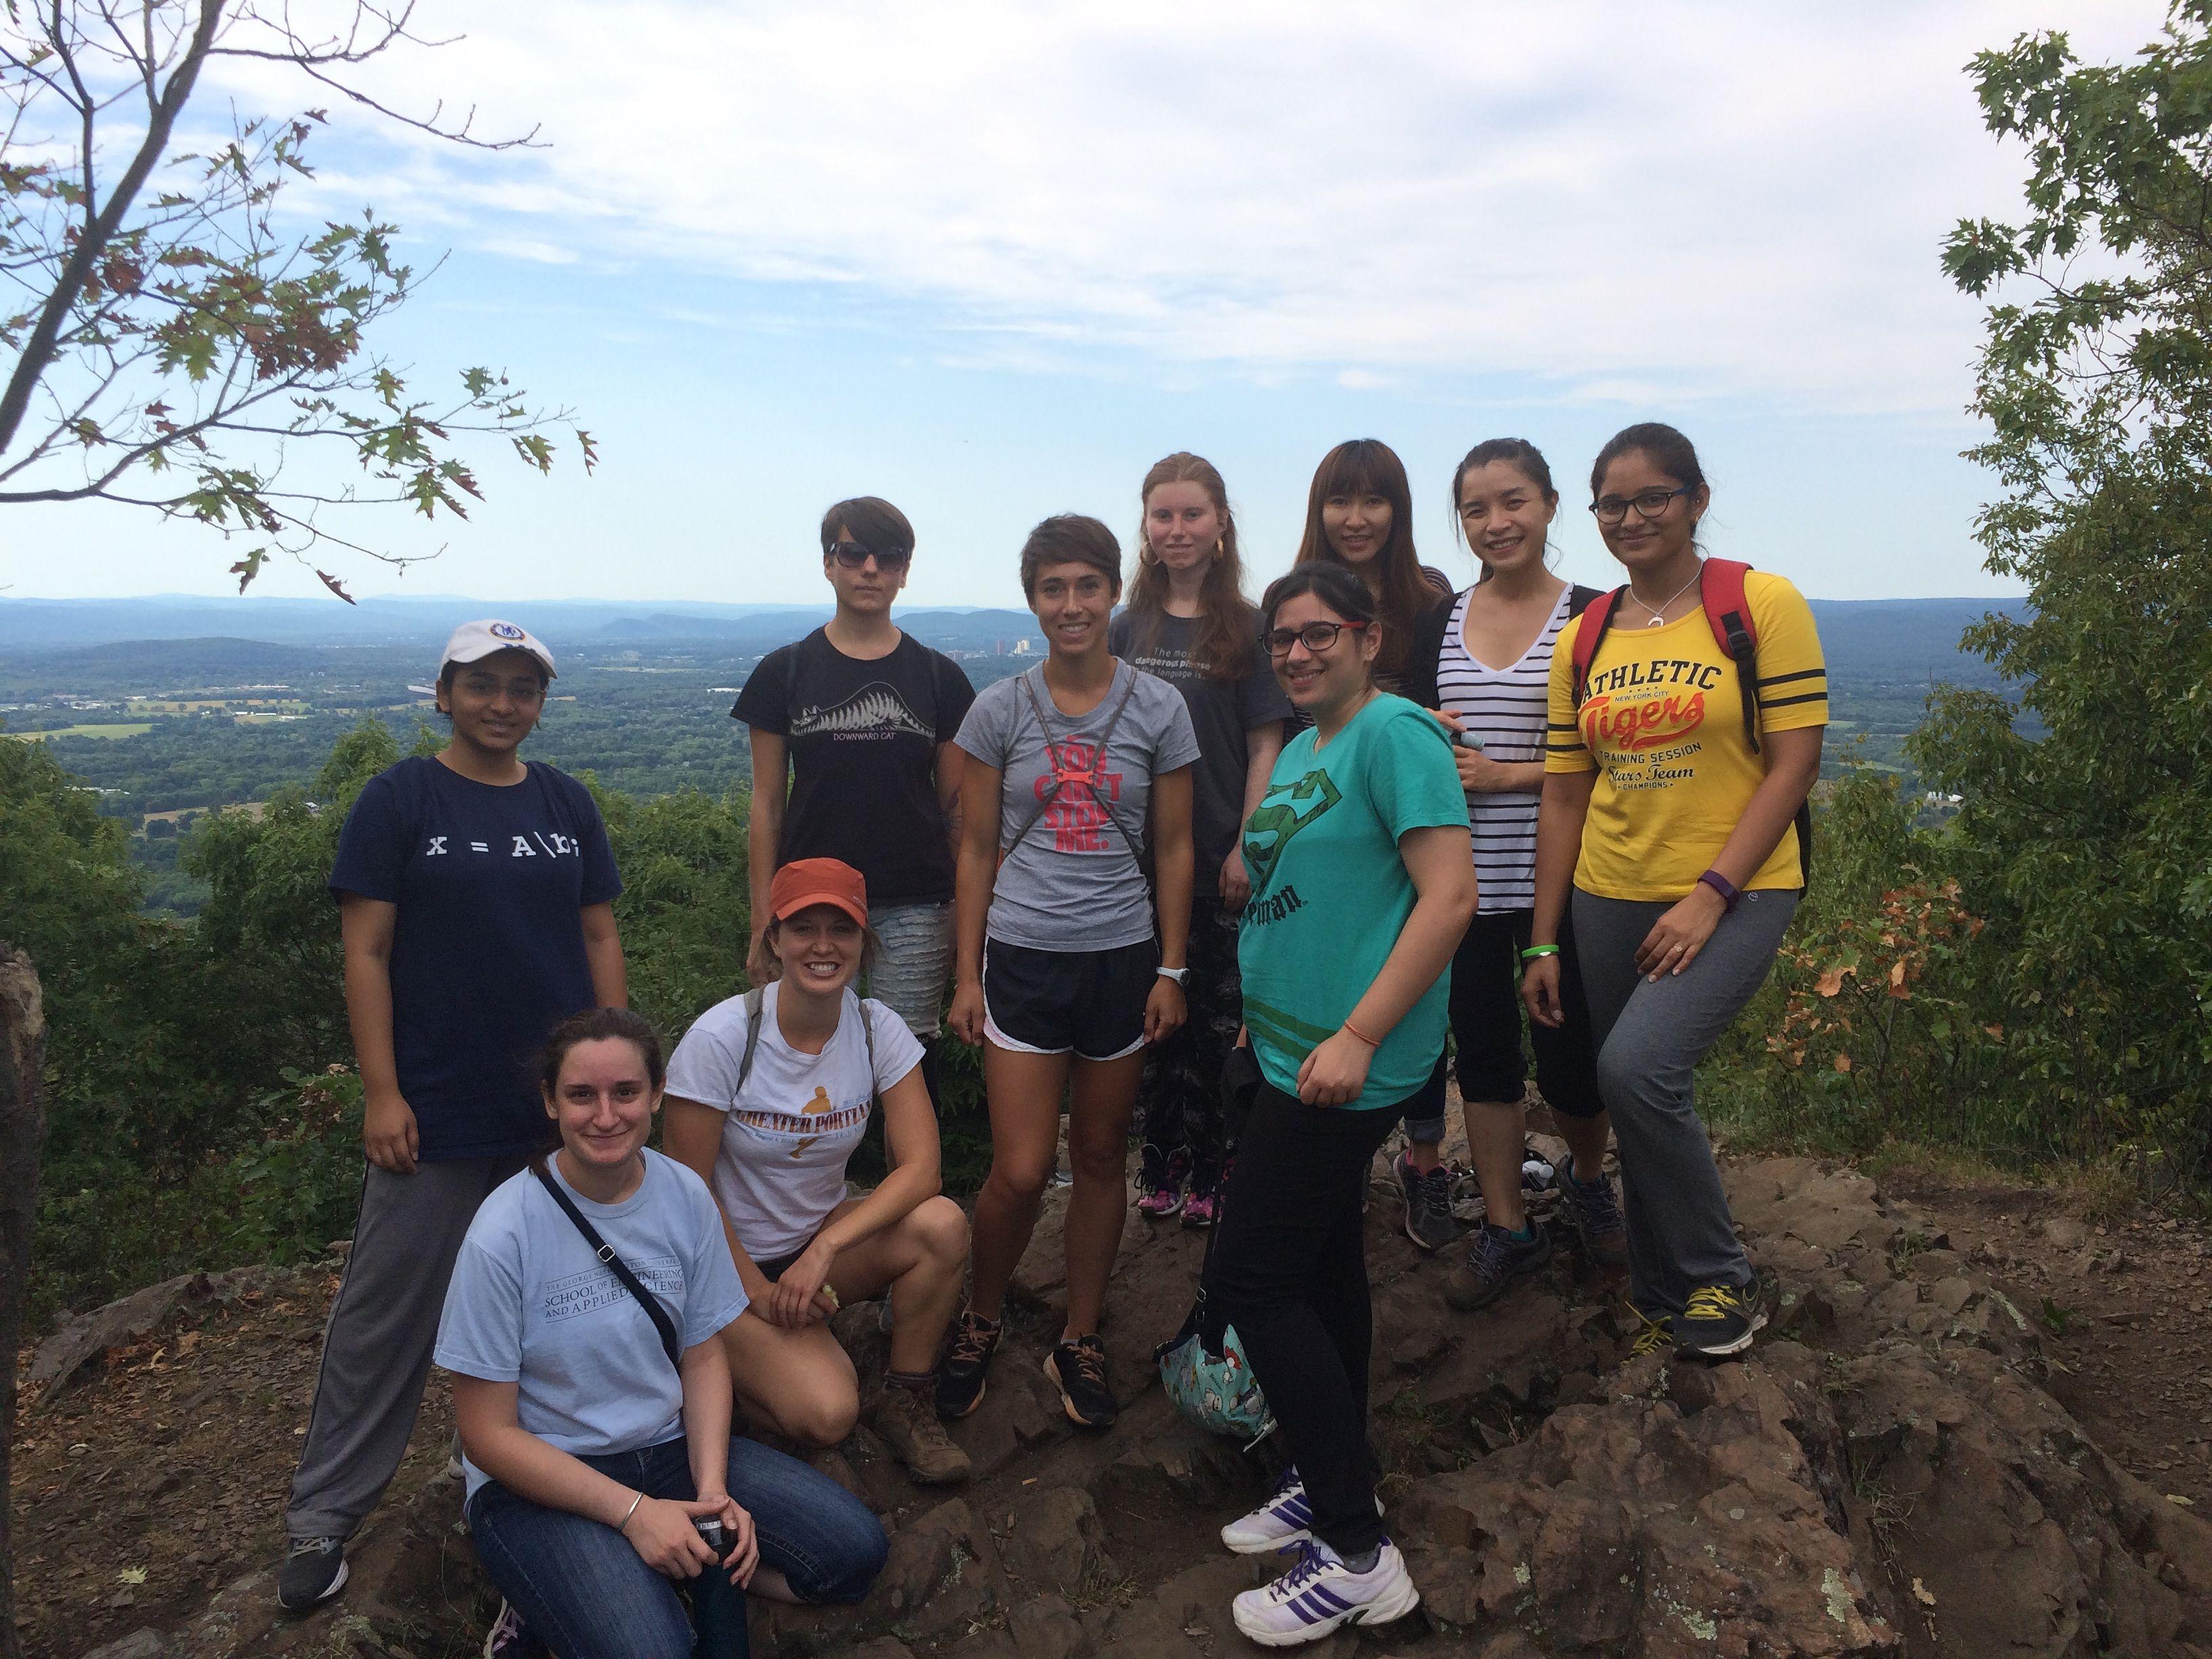 CSWomen hikes Mt. Norwottuck from the Notch